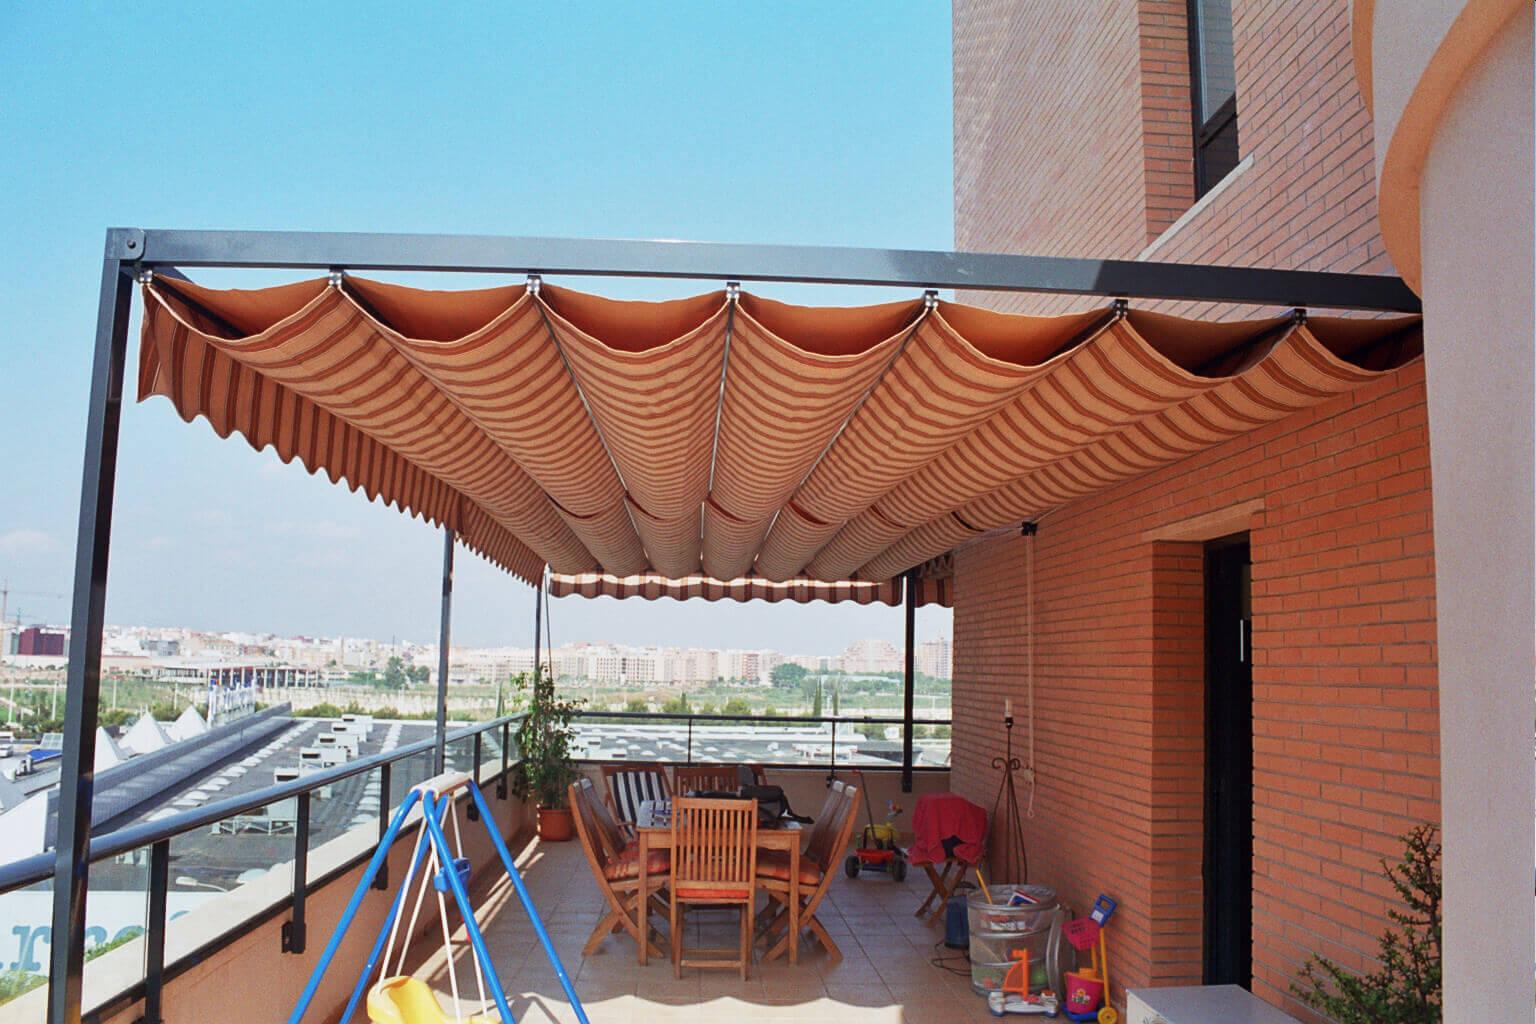 Toldo p rgola persianas g mez for Toldos para terrazas economicos